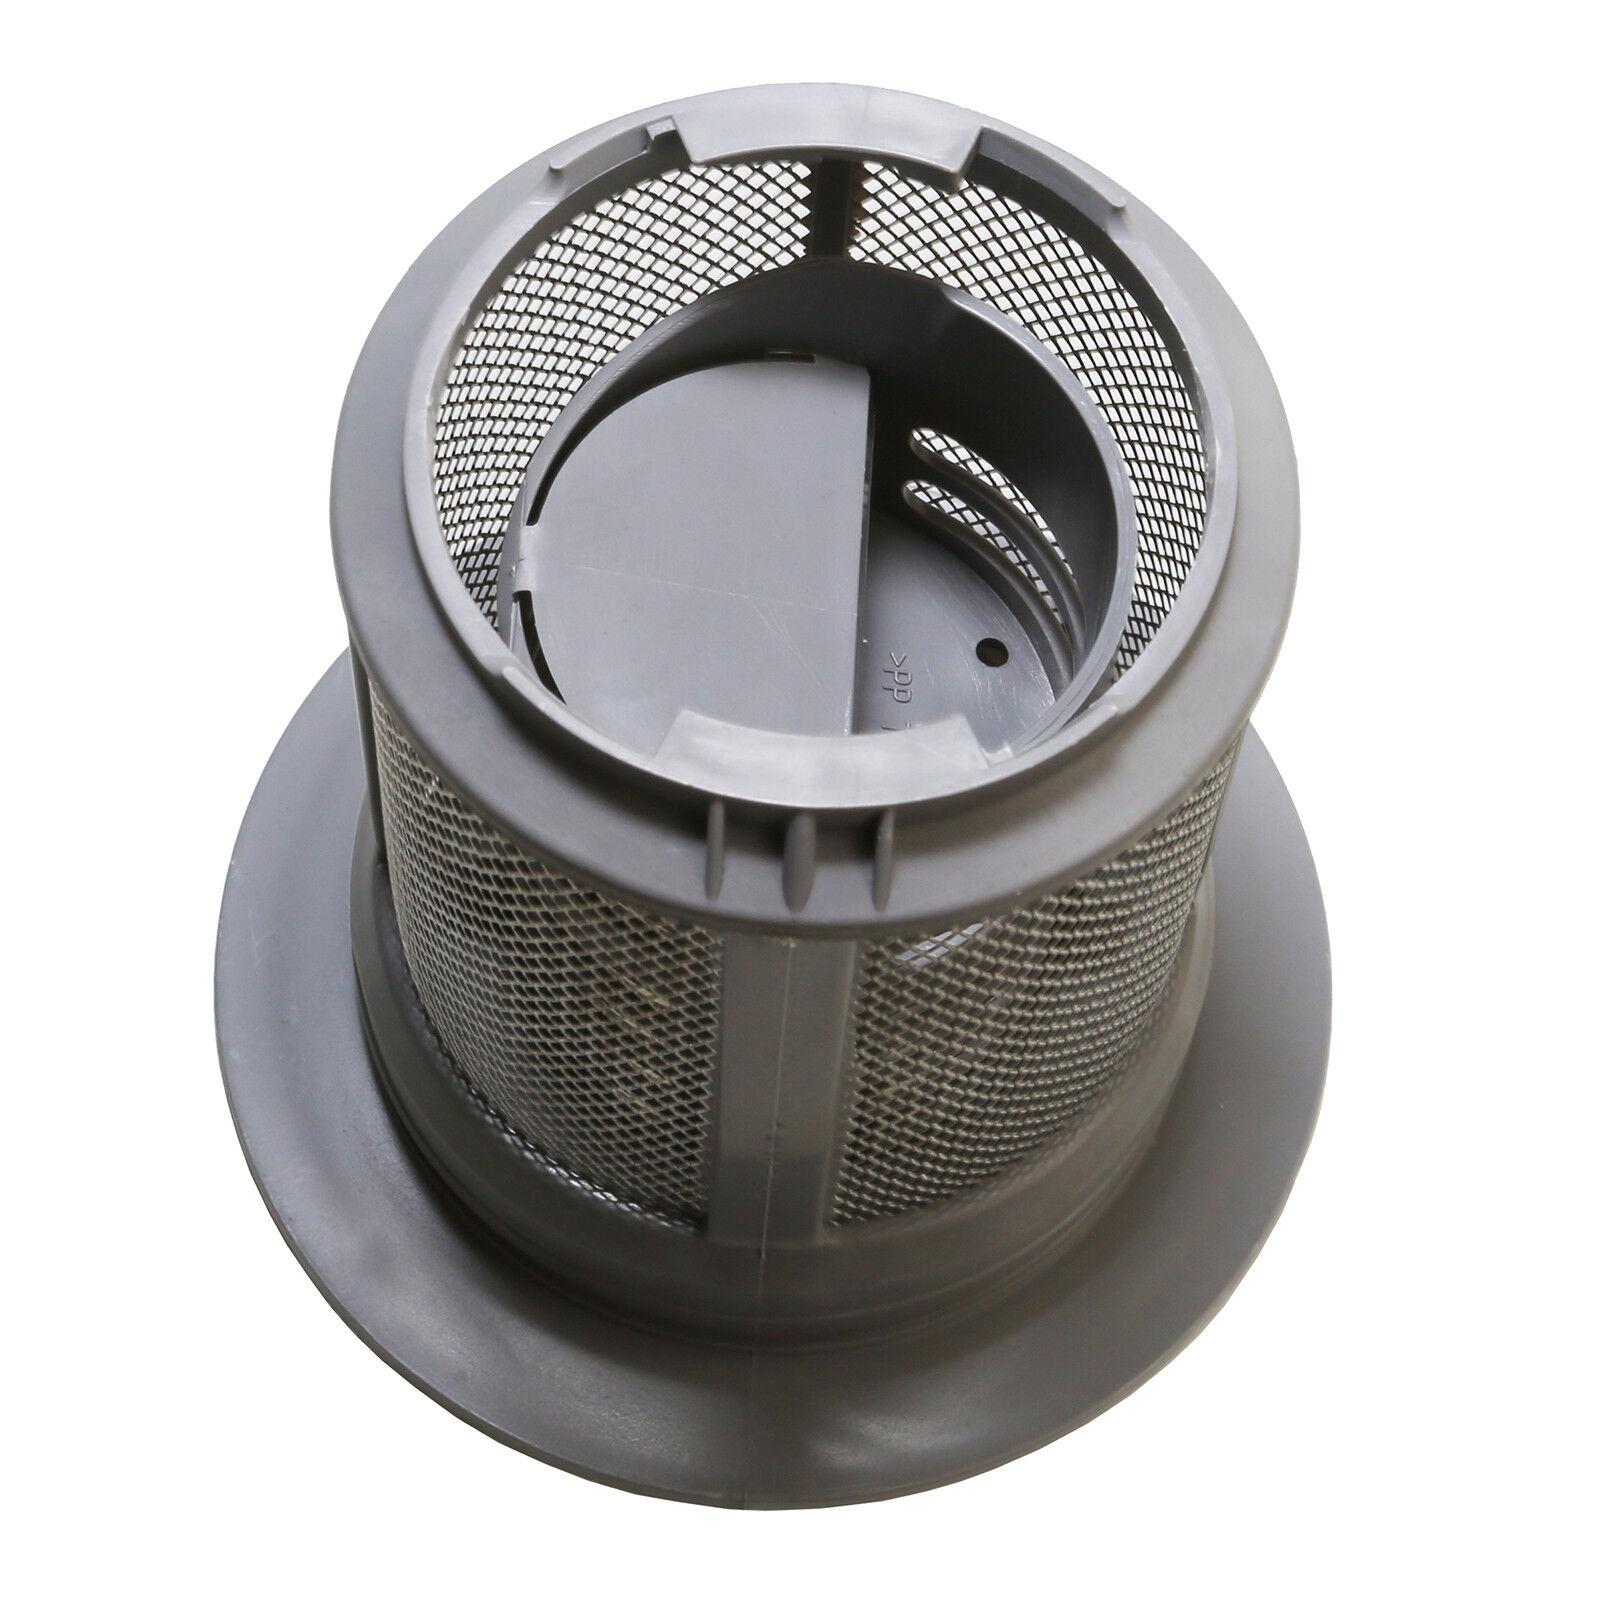 cleaner Bosch SGS3042GB//03 SGS3042GB//03 SGS3042GB//03 lave-vaisselle panier à couverts